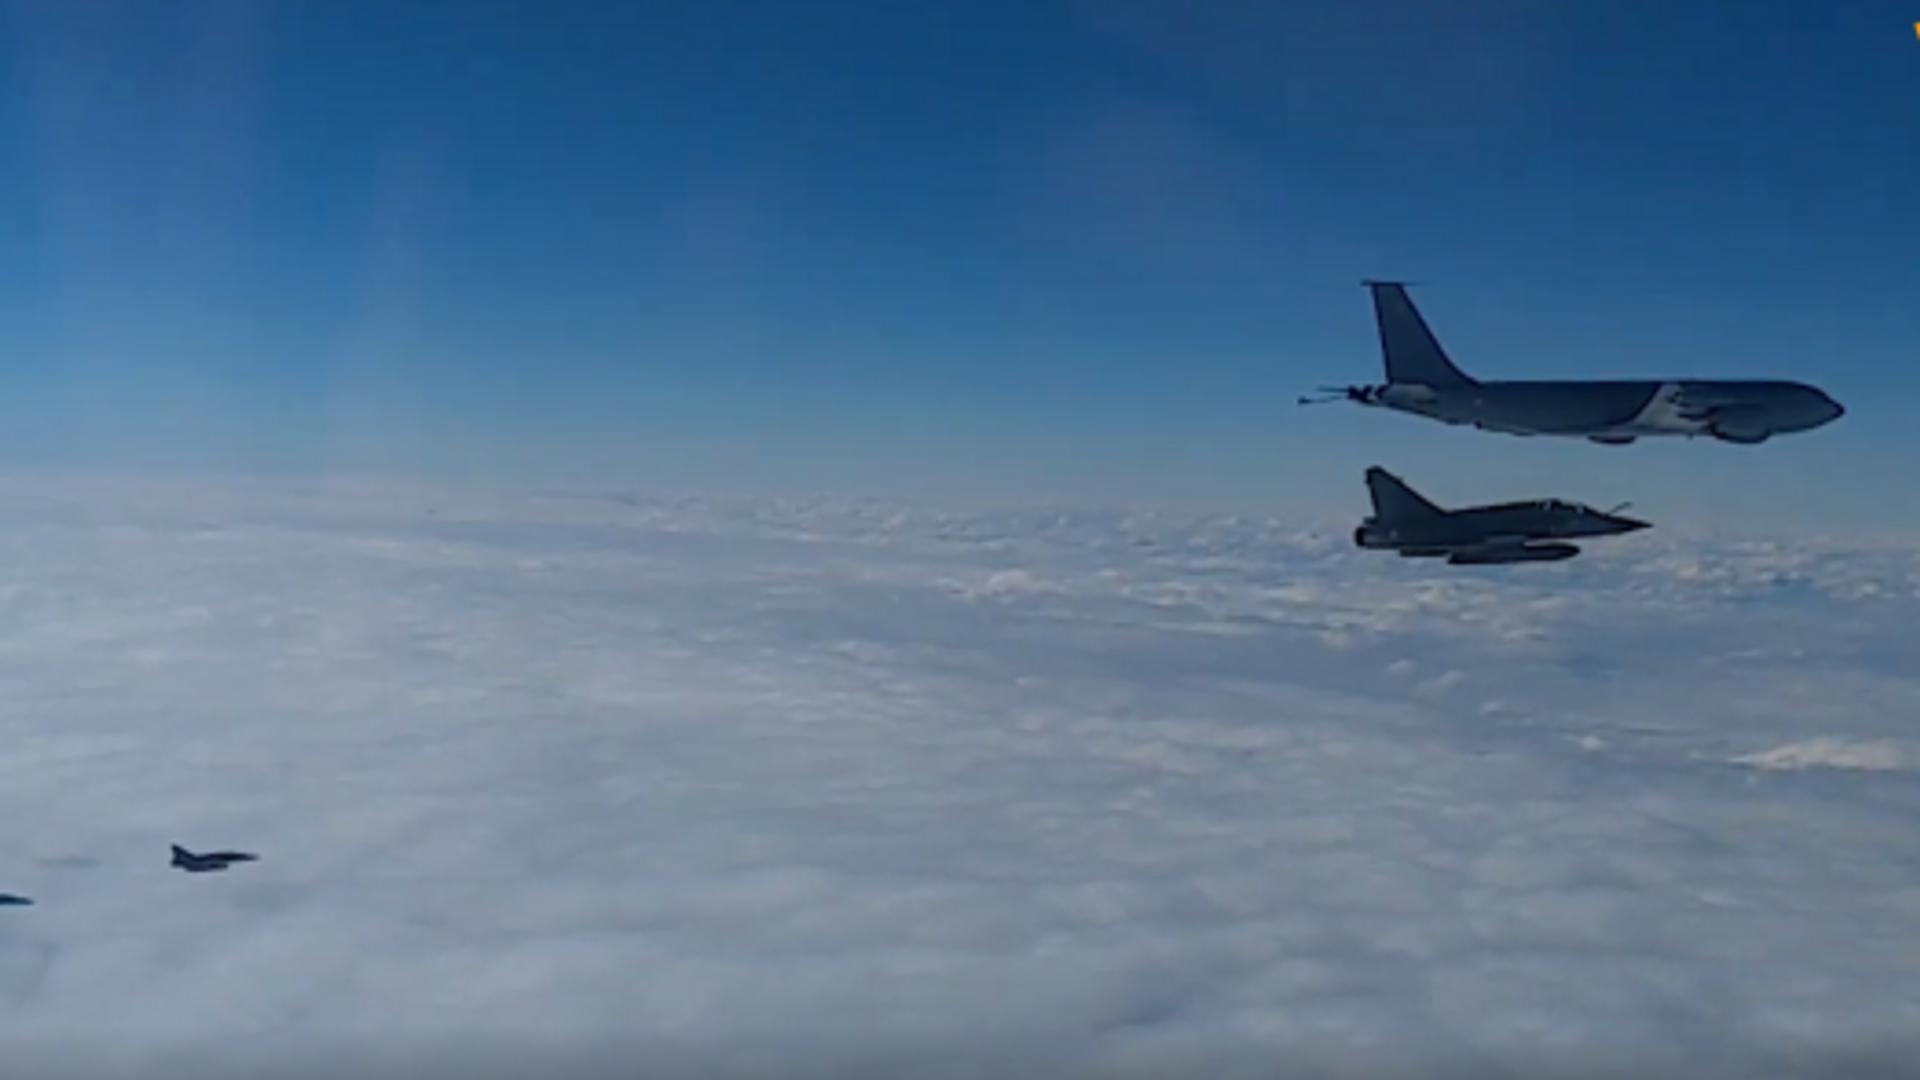 Así escoltan los Su-27 rusos a aviones franceses sobre el mar Negro - Sputnik Mundo, 1920, 18.02.2021